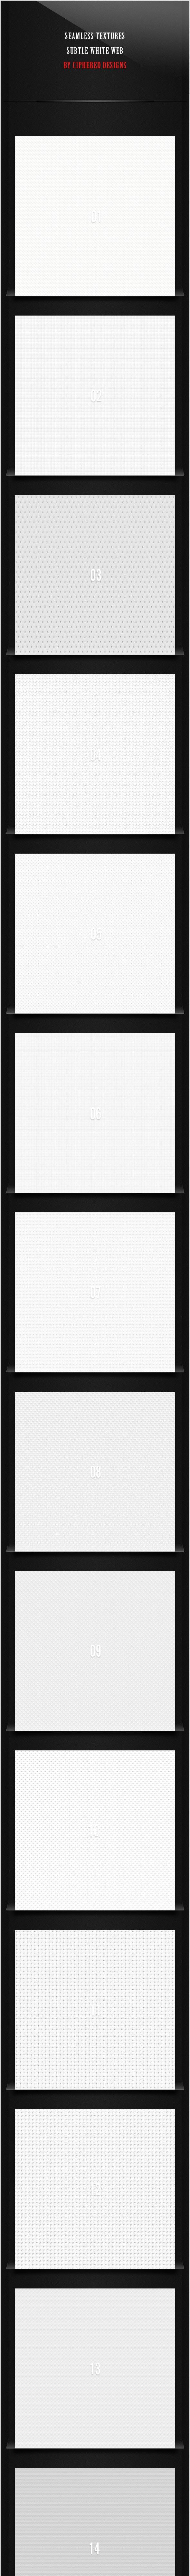 Seamless Textures - Subtle White Web - Textures / Fills / Patterns Photoshop